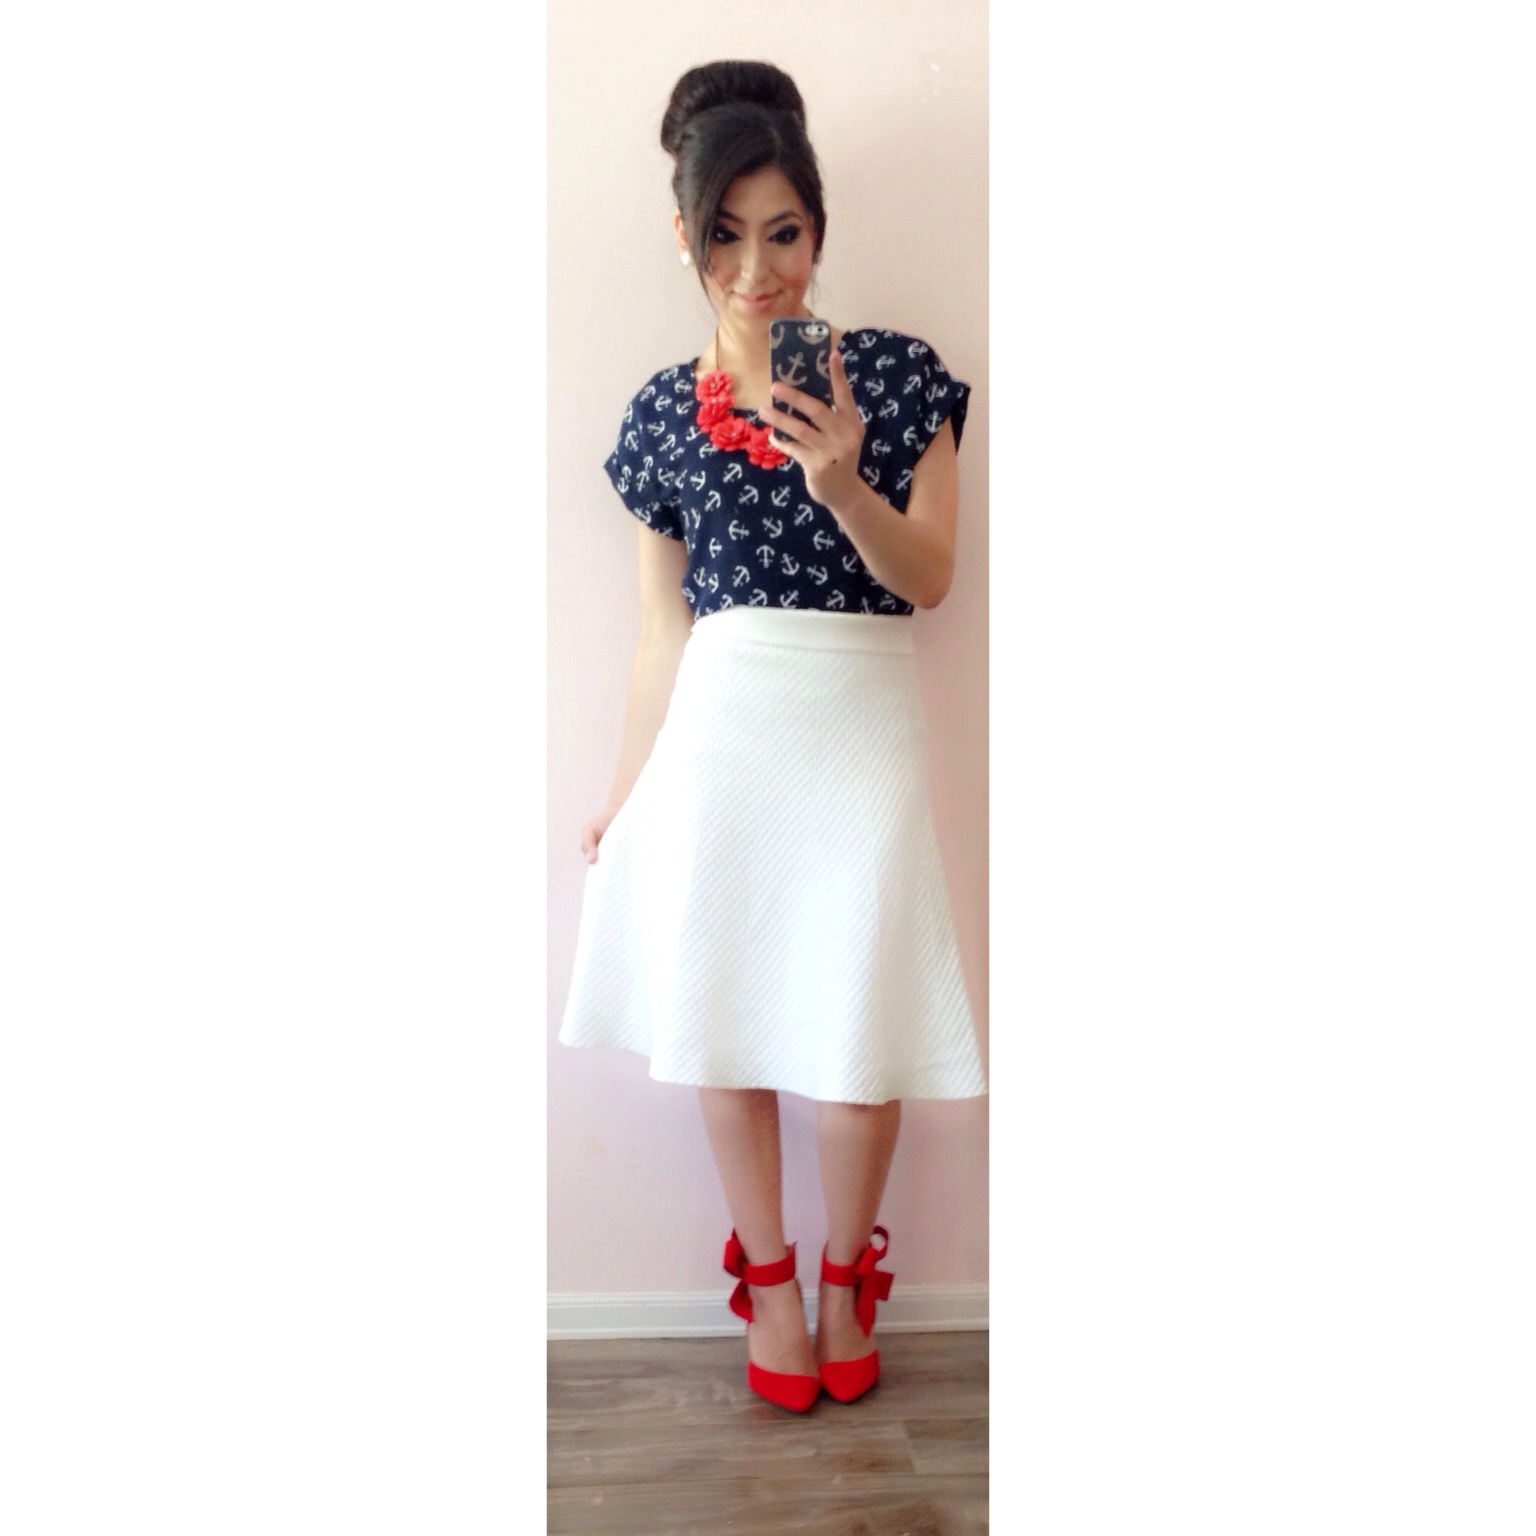 Modest Summer Nautical Outfit! Featuring Debbieu2019s Closet +GIVEAWAY!! | A Modest Fashion u0026 Faith Blog